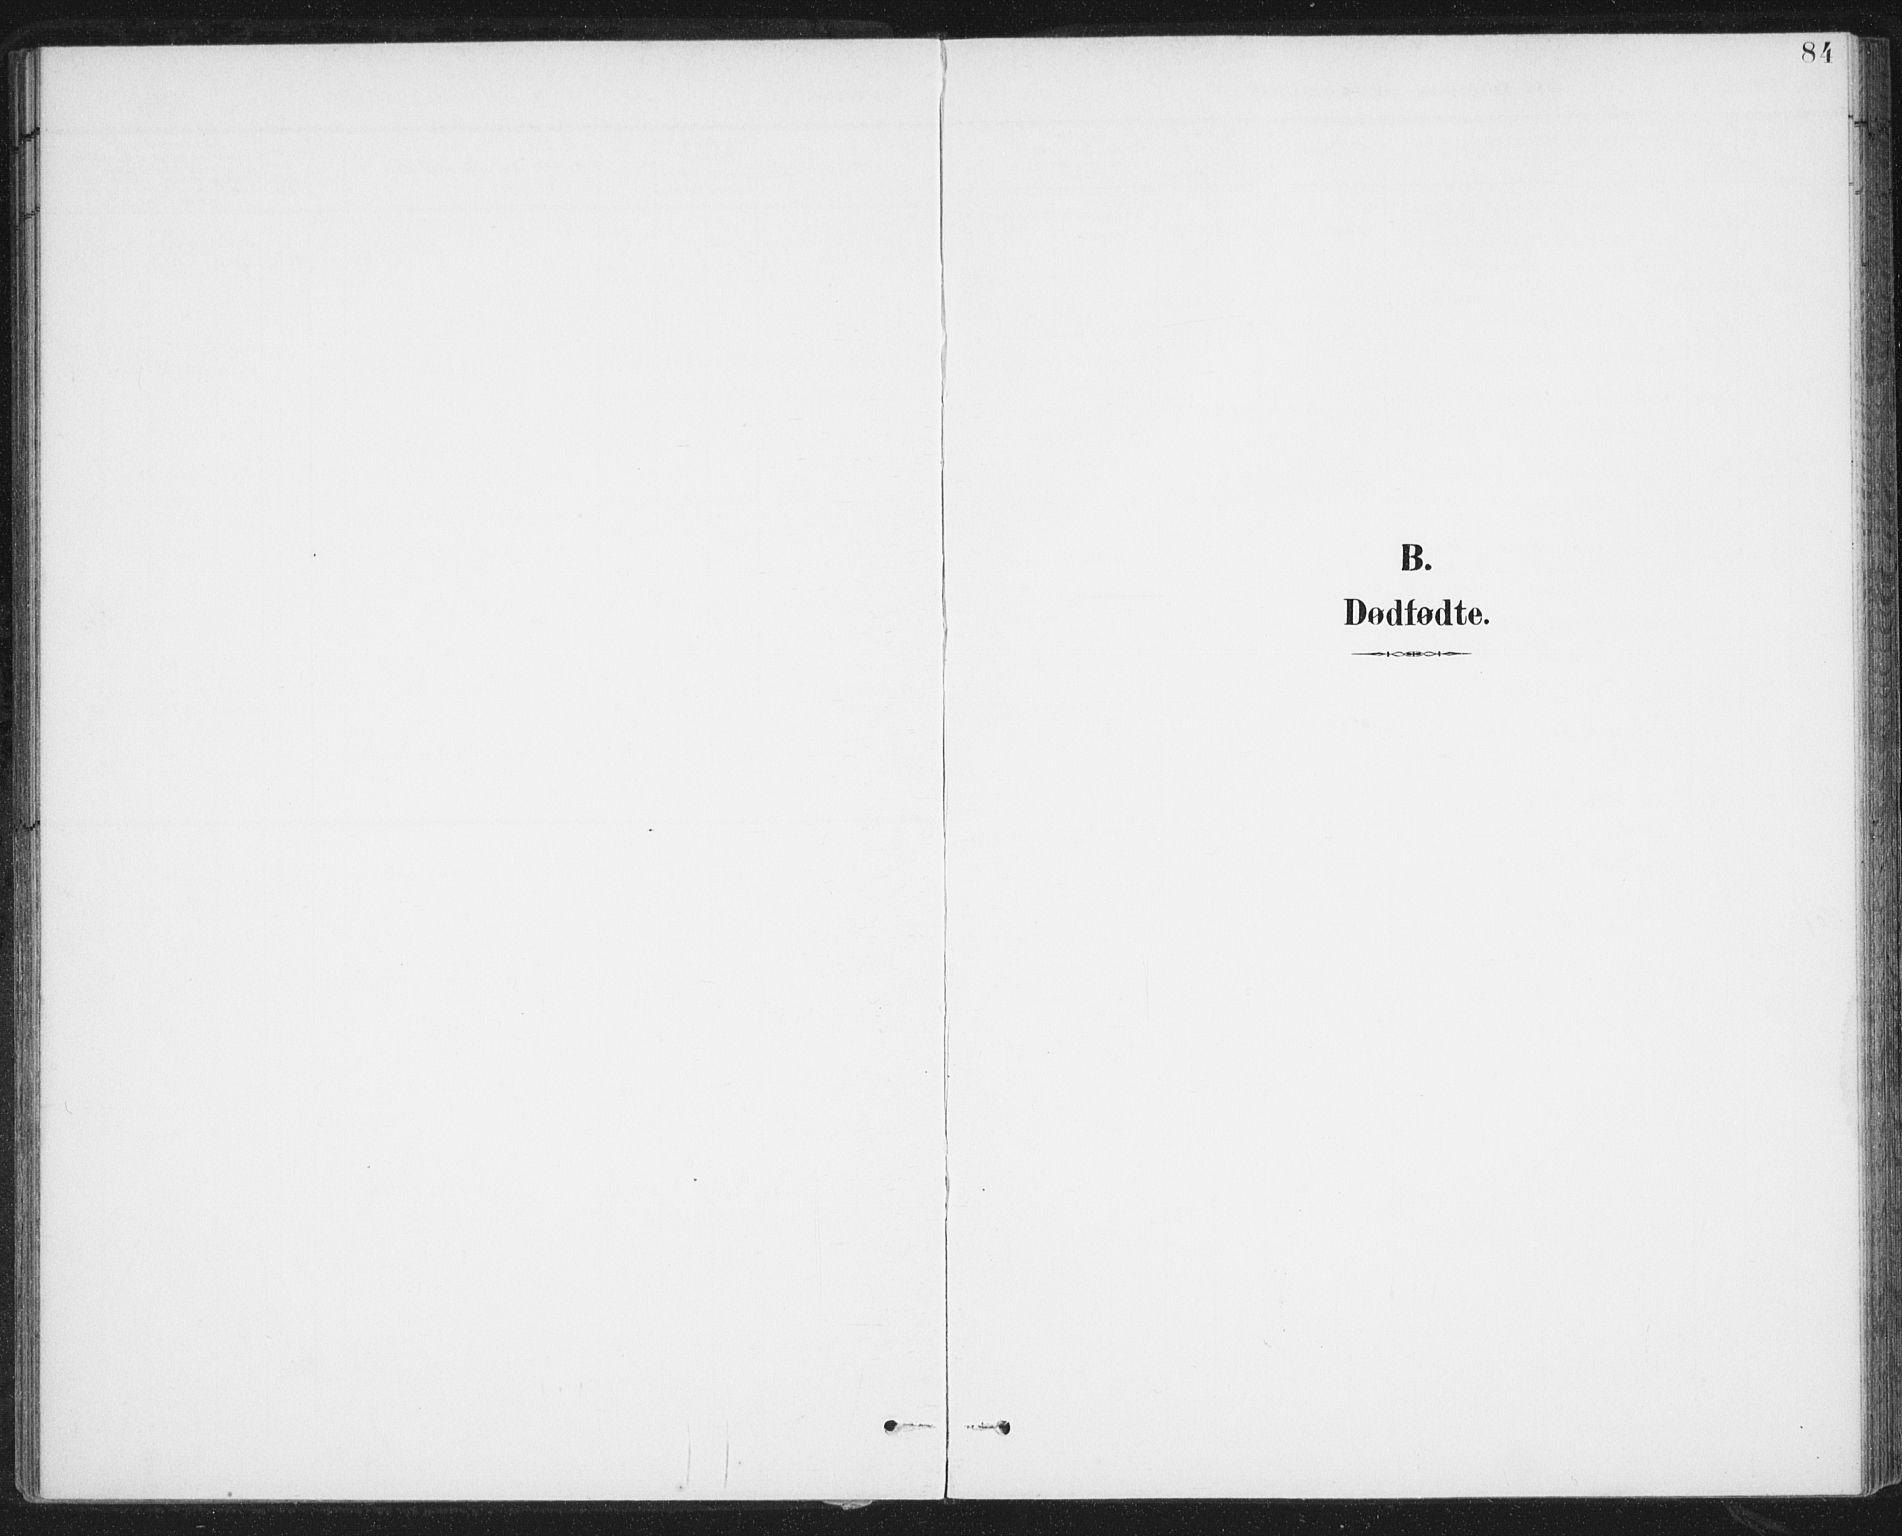 SAT, Ministerialprotokoller, klokkerbøker og fødselsregistre - Nordland, 899/L1437: Ministerialbok nr. 899A05, 1897-1908, s. 84